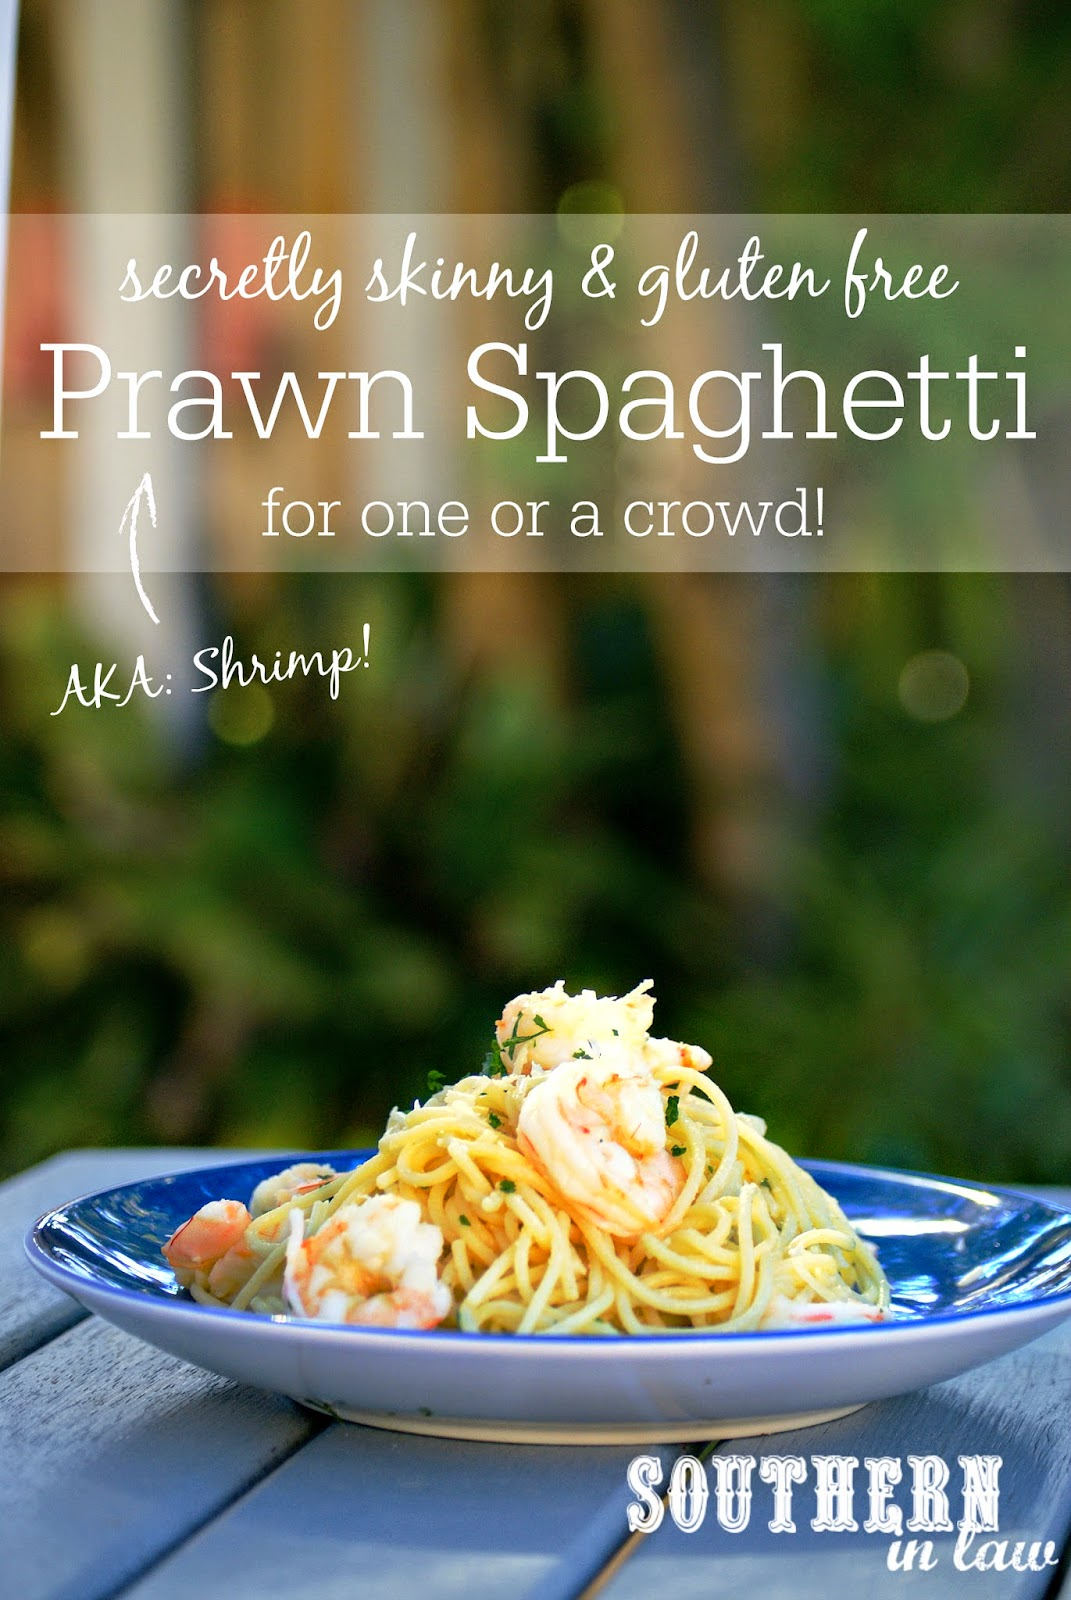 Lightened Up Shrimp Spaghetti Recipe - gluten free, low fat, clean eating friendly, healthy spaghetti recipe